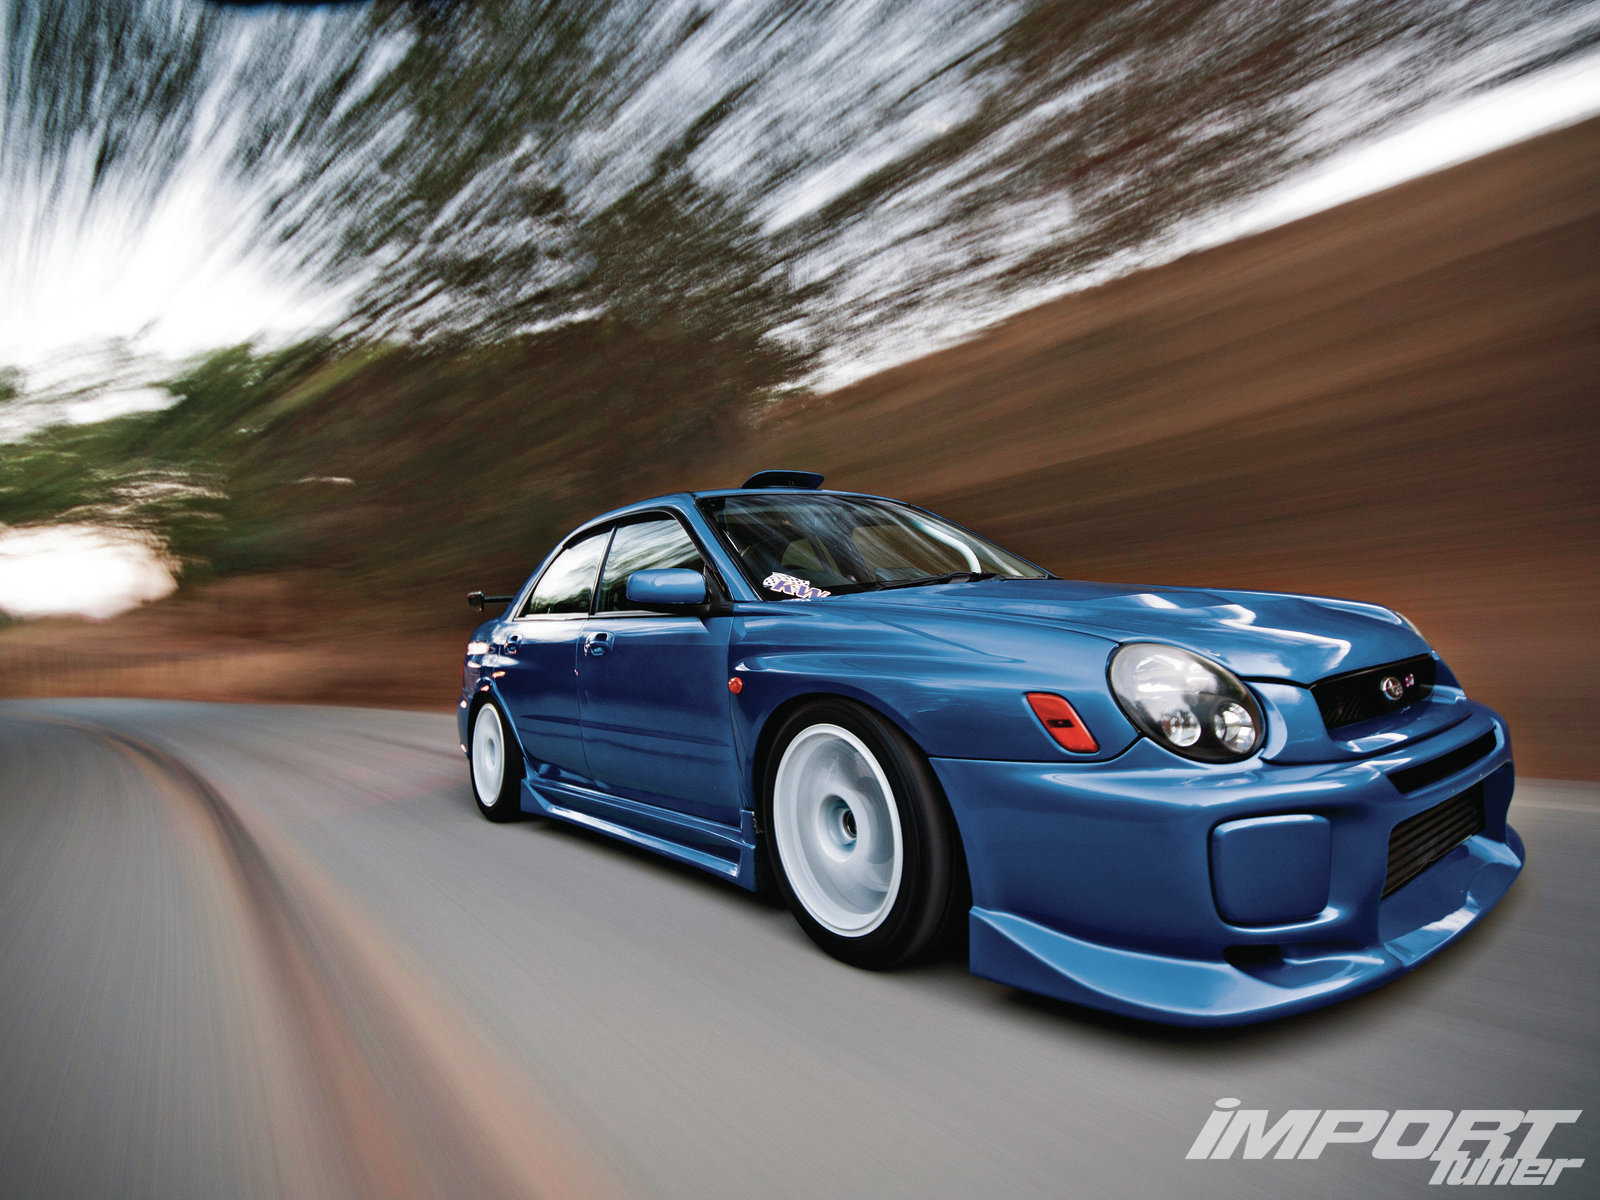 2002 Subaru Impreza Wrx Import Tuner Magazine